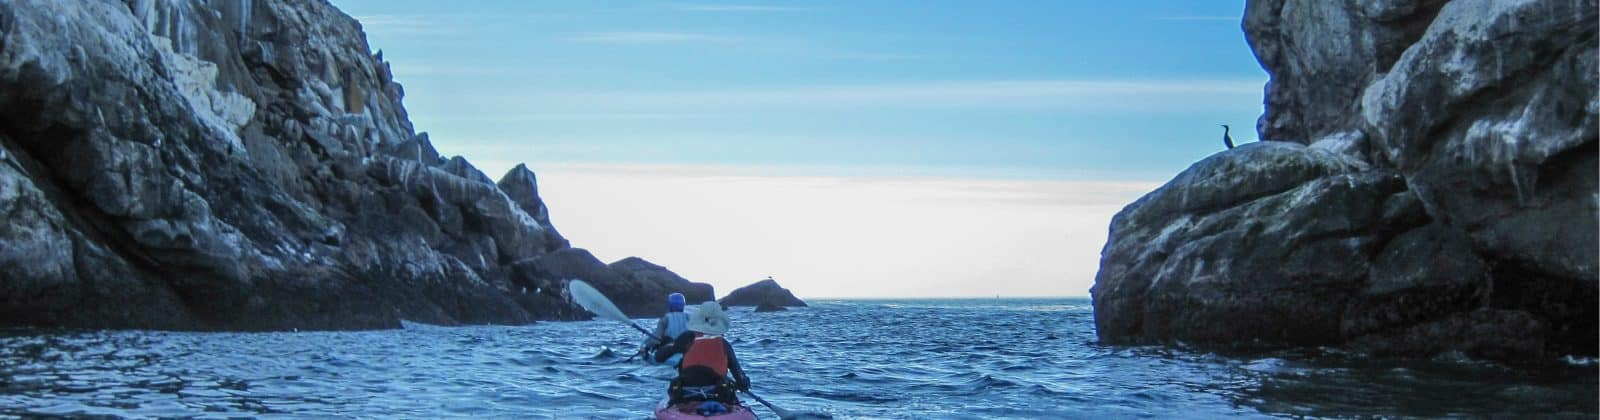 Kayaking in Northern Virginia